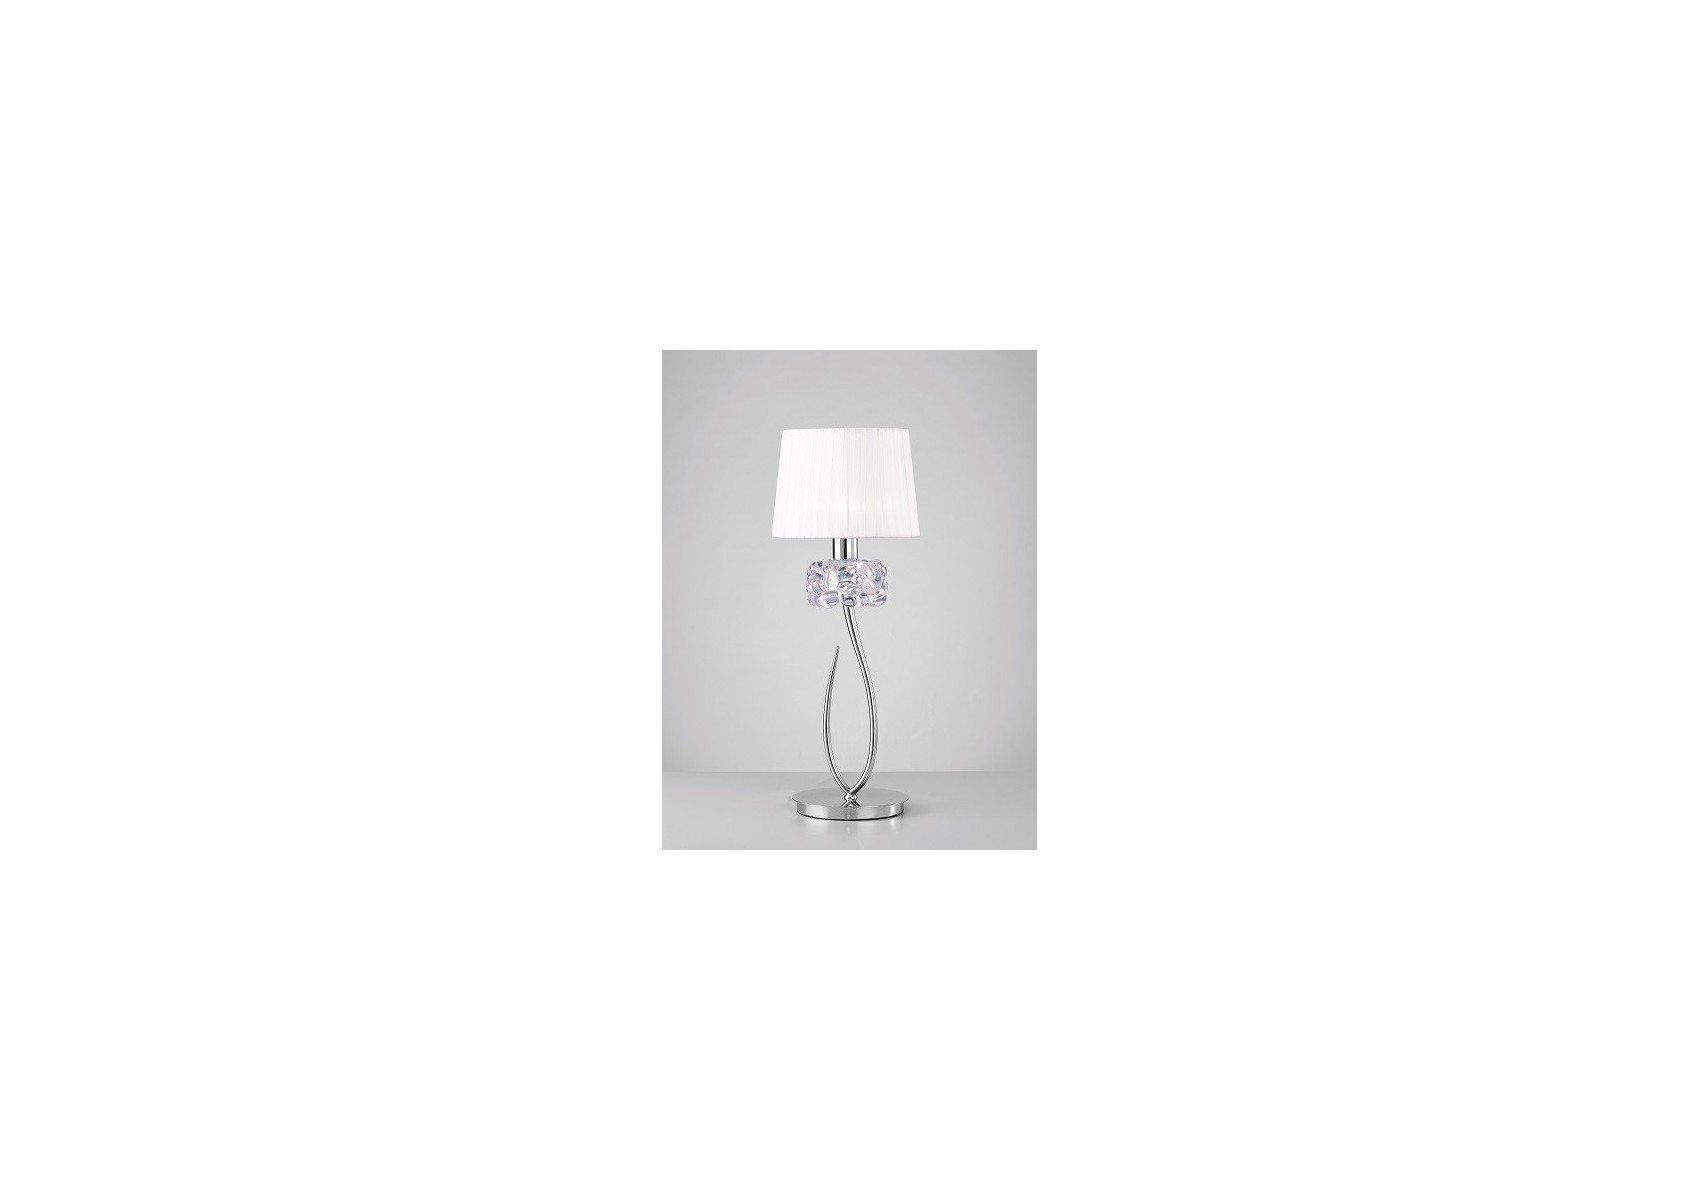 Grande Lampe De Table Design Loewe 1 Lampe Boite A Design